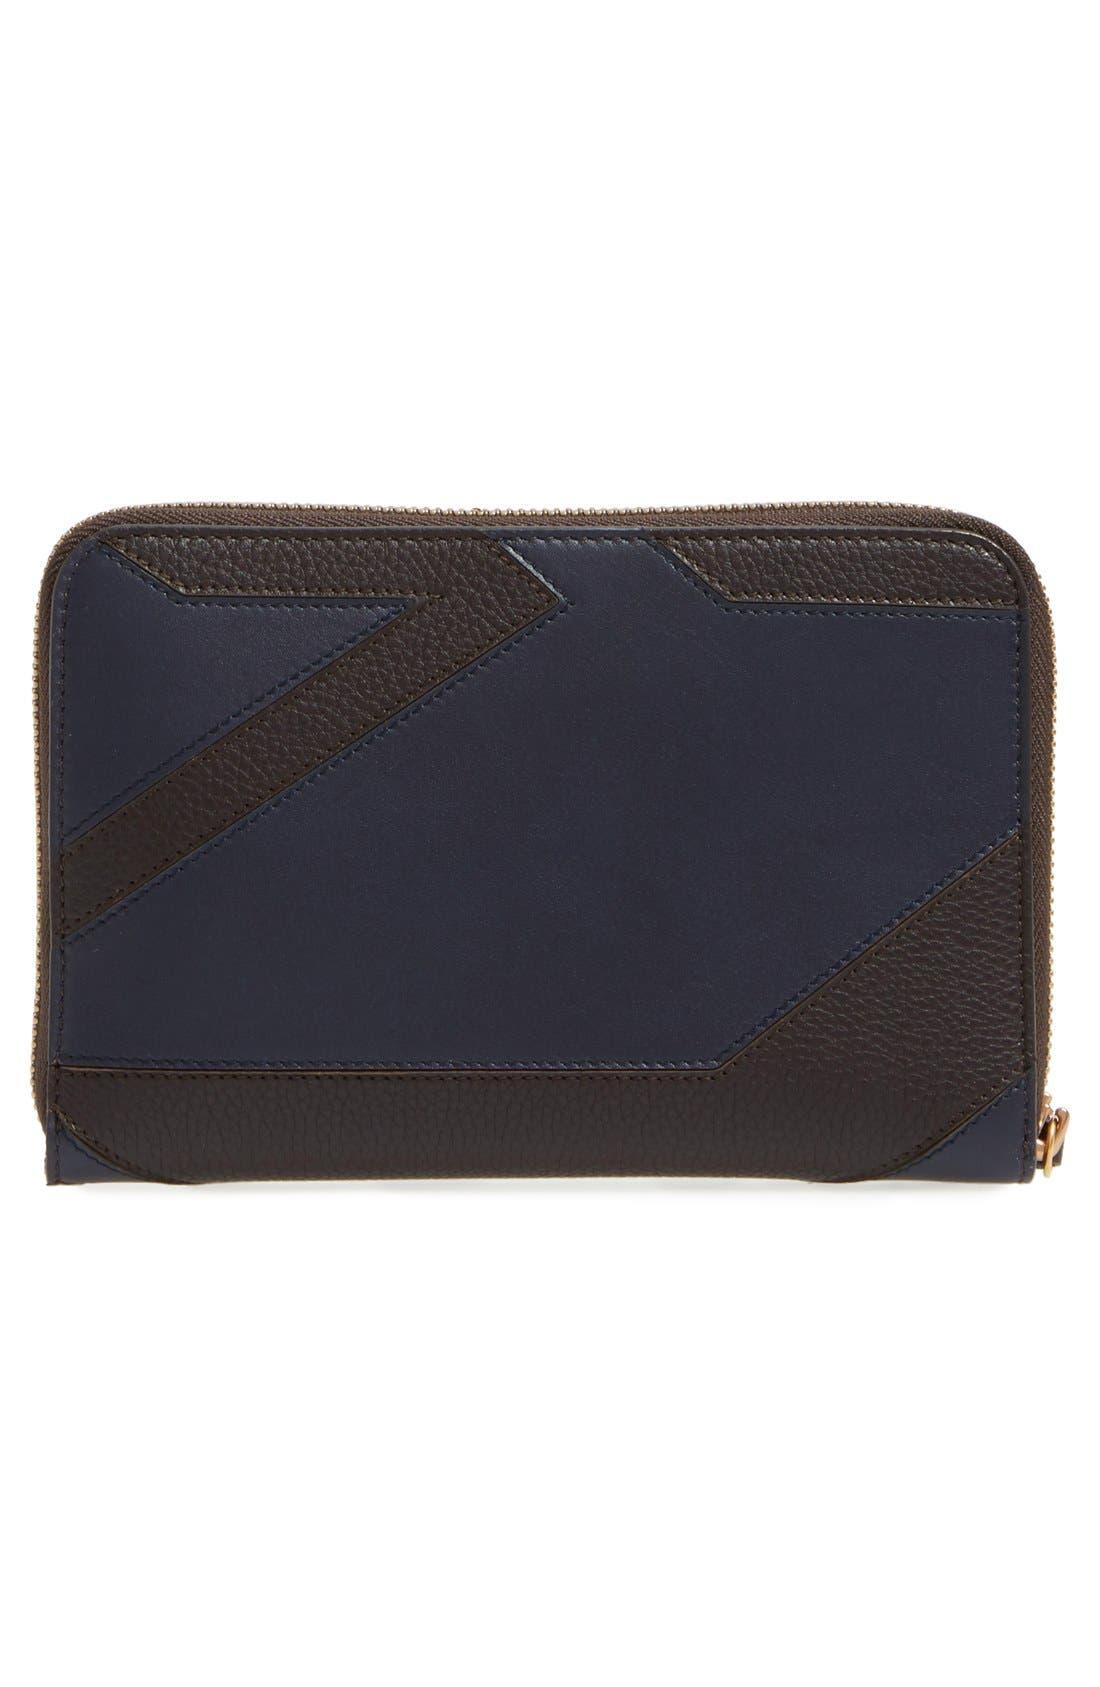 Zip Wallet,                             Alternate thumbnail 5, color,                             245